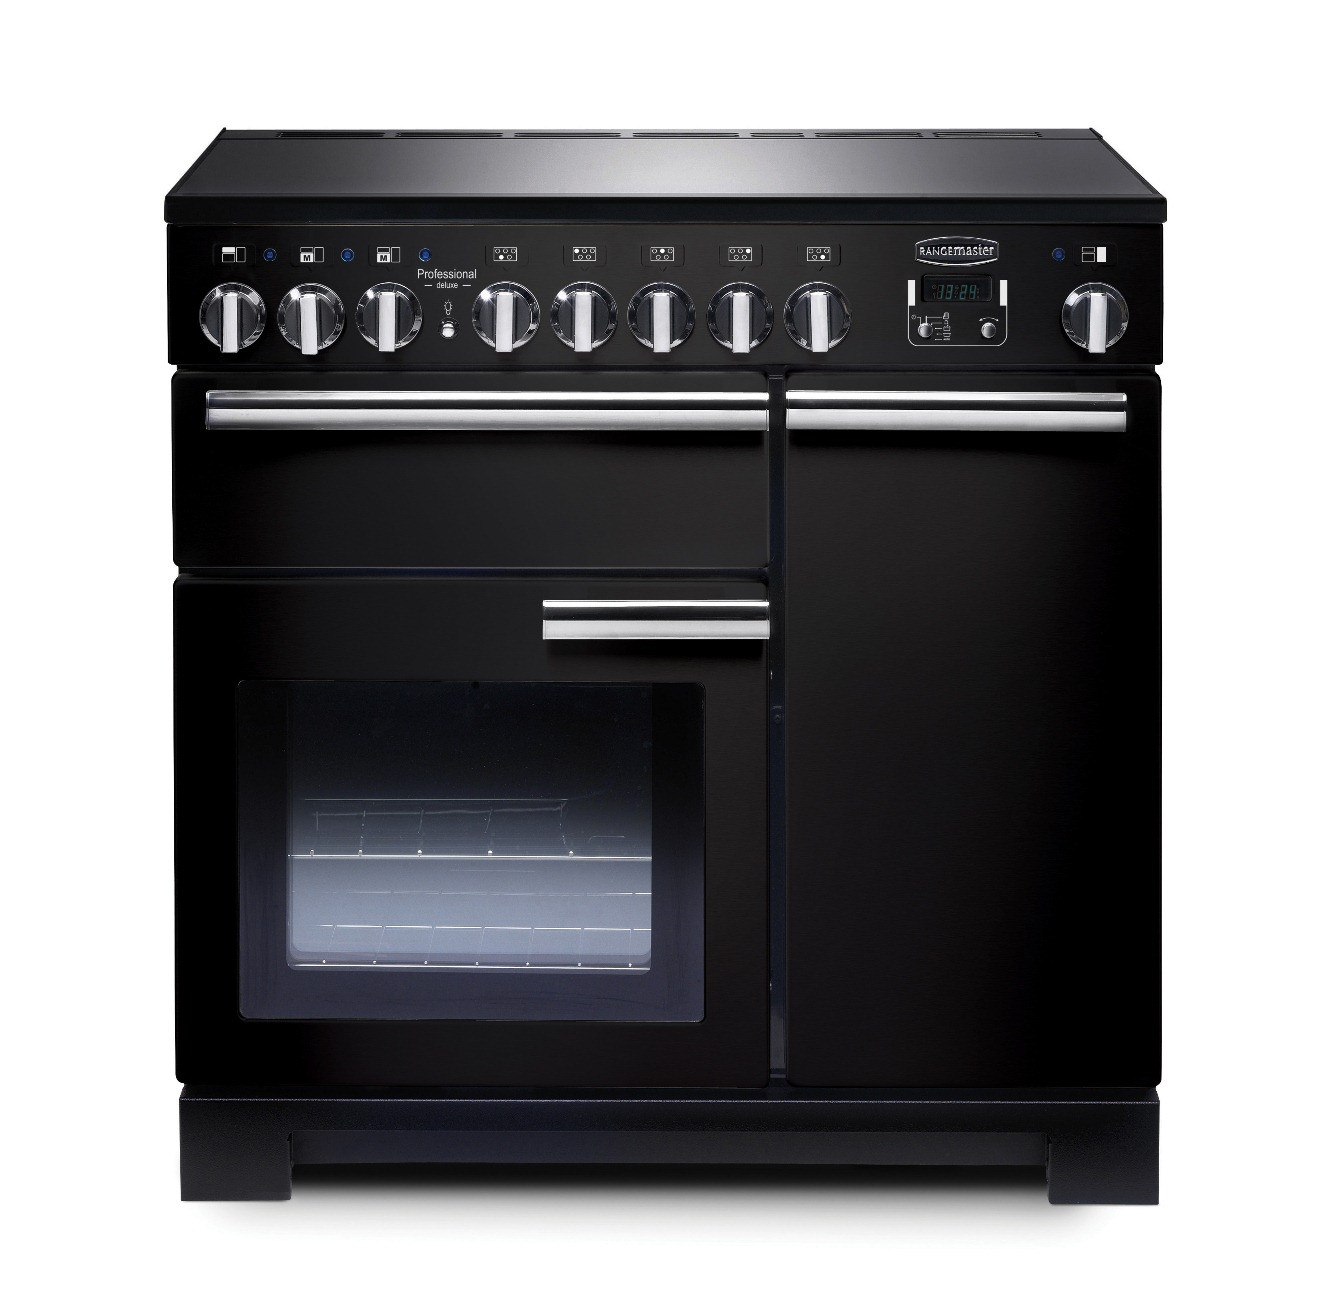 Rangemaster Professional Deluxe 90 Induction Black Range Cooker 97870